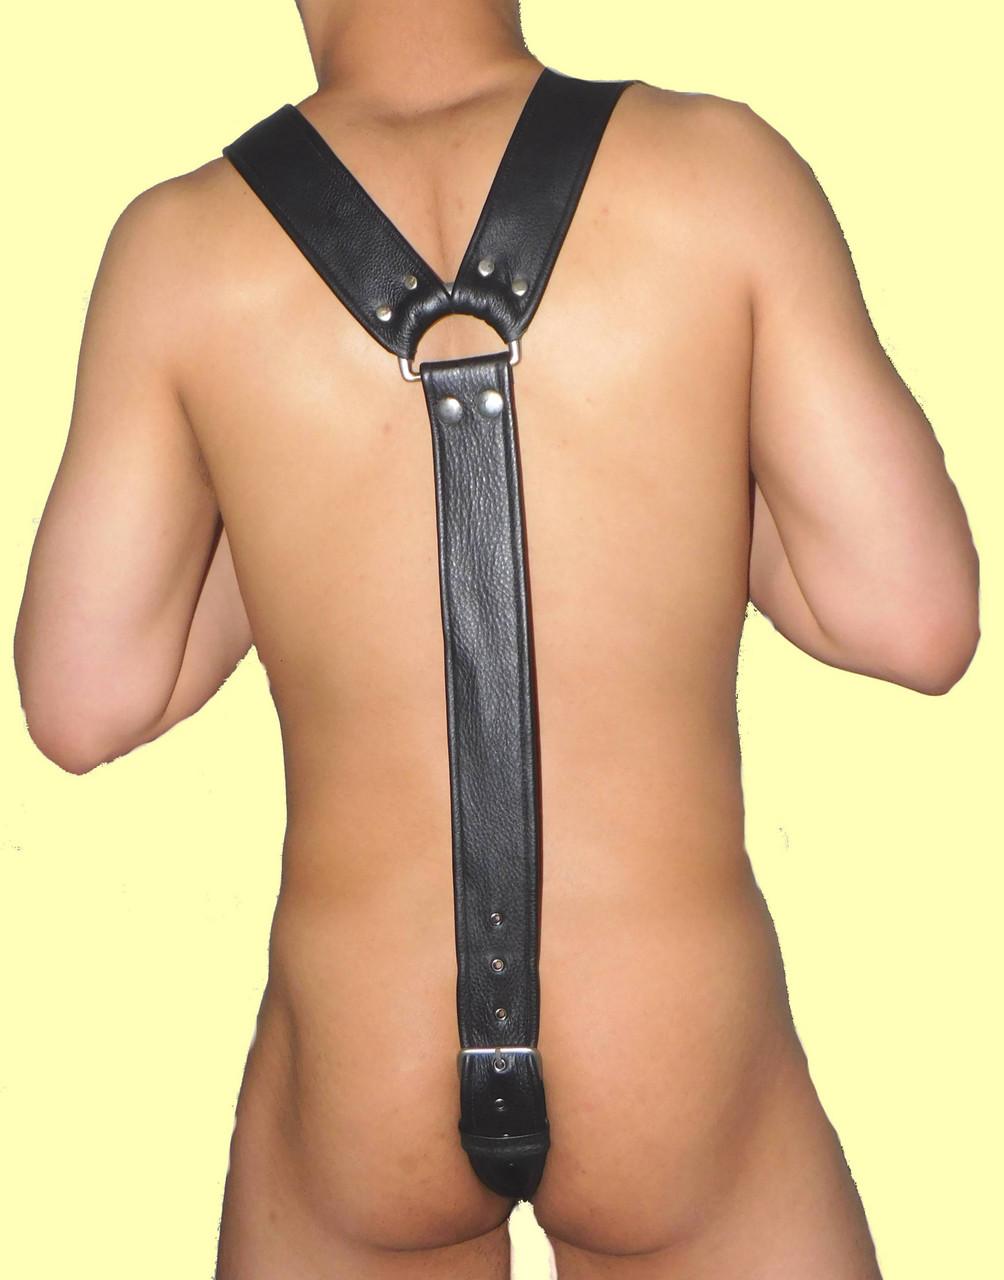 all around harness